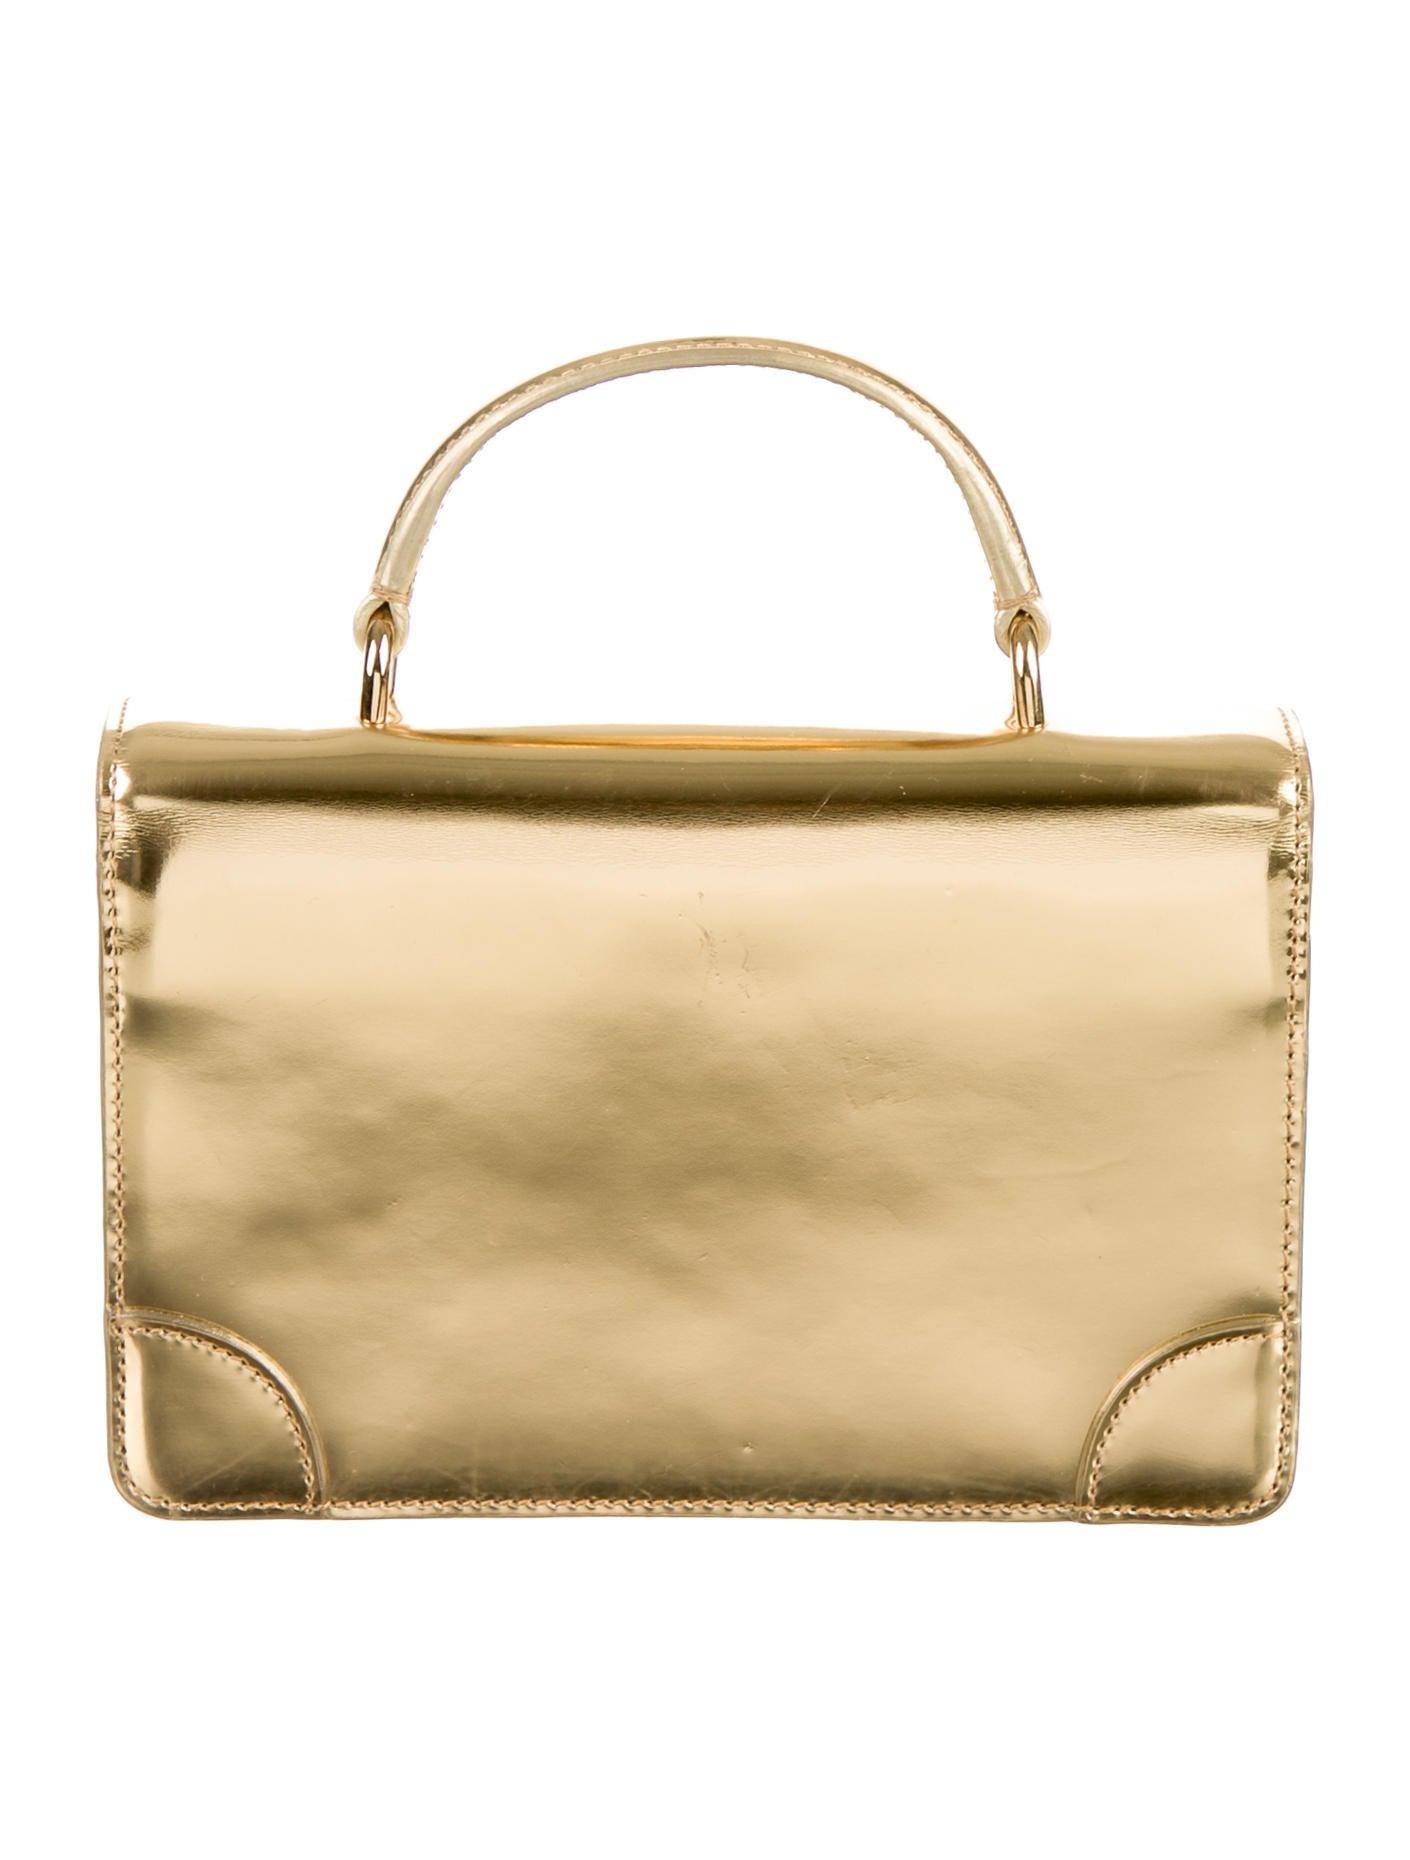 a3fb419f15fb Ralph Lauren Ricky Mini Metallic Leather Crossbody Bag - Handbags ...